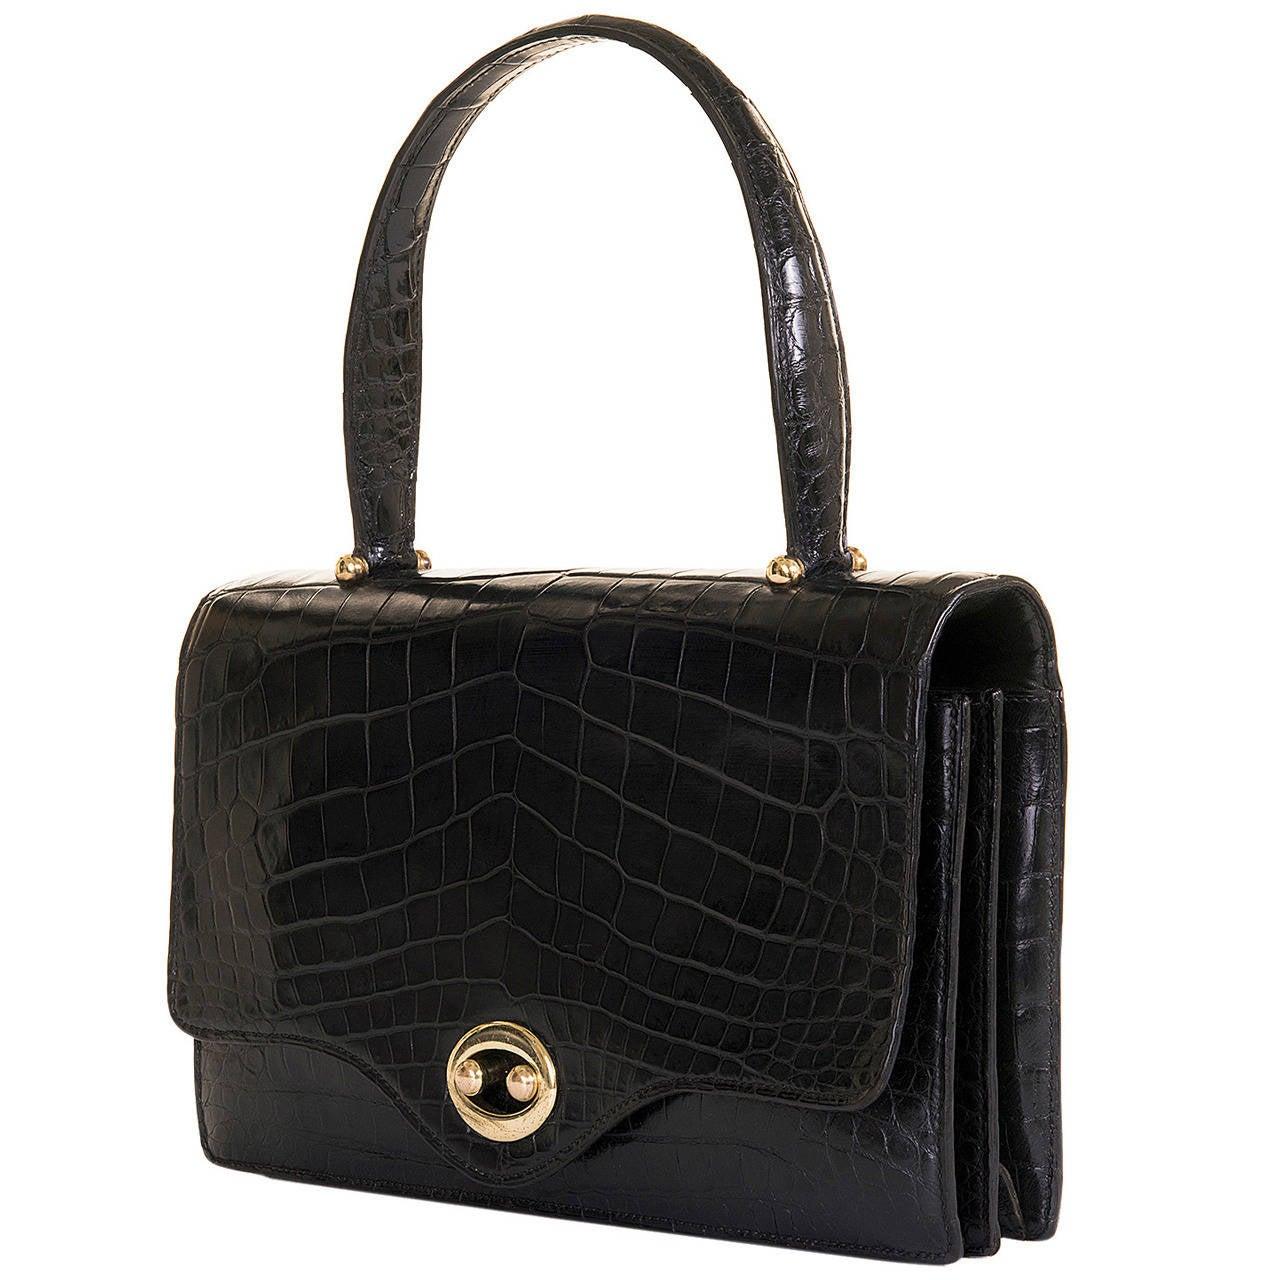 a very rare vintage hermes 26cm black crocodile 39 sac boutonniere 39 bag at 1stdibs. Black Bedroom Furniture Sets. Home Design Ideas